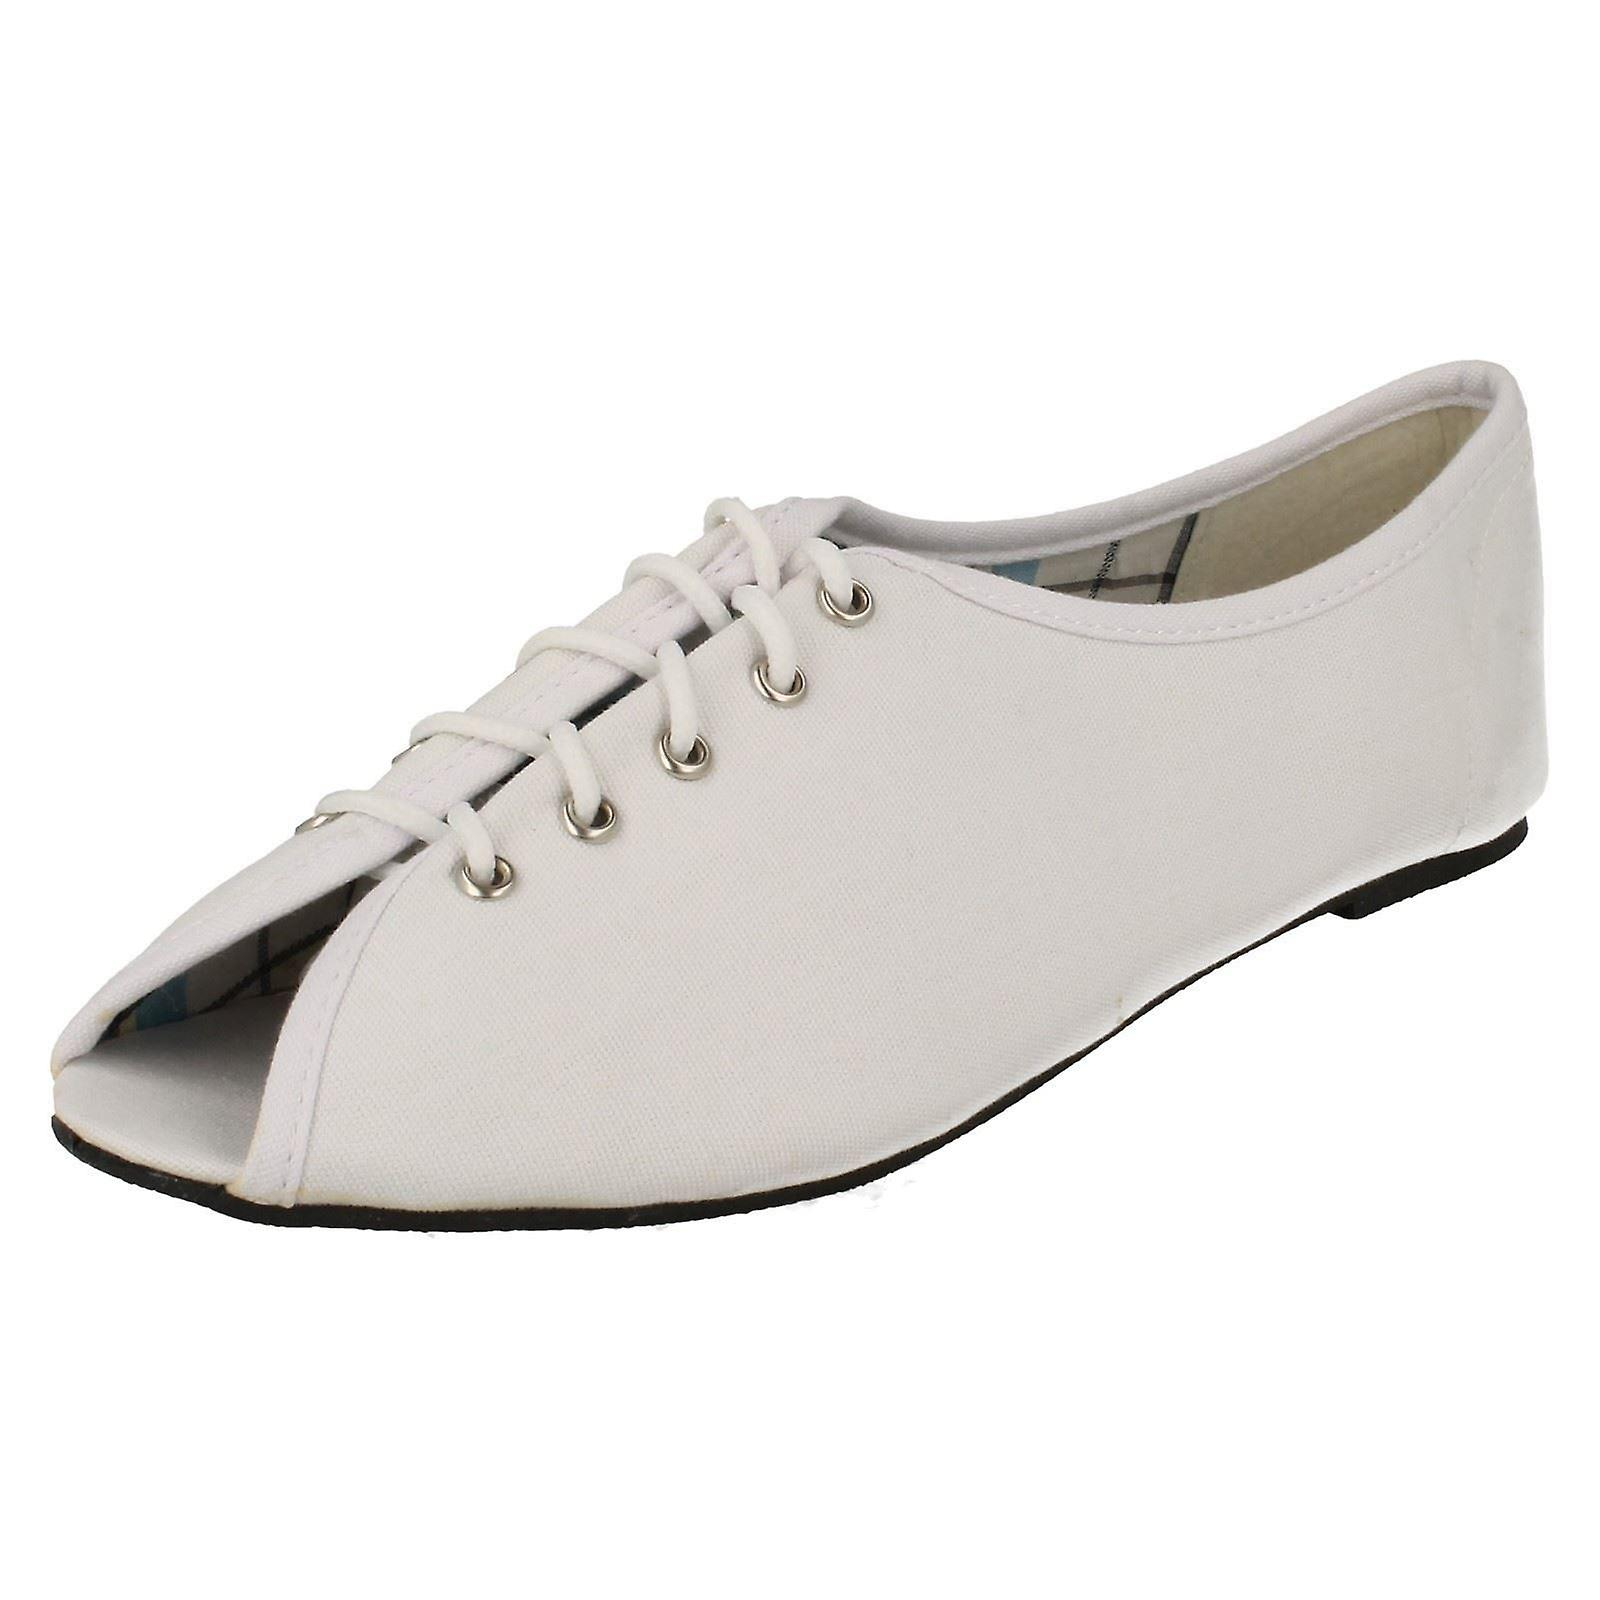 02d883e78ab306 Geox Hampstead U74E3B00043C6001 Ellegant alle Jahr Männer Schuhe ...